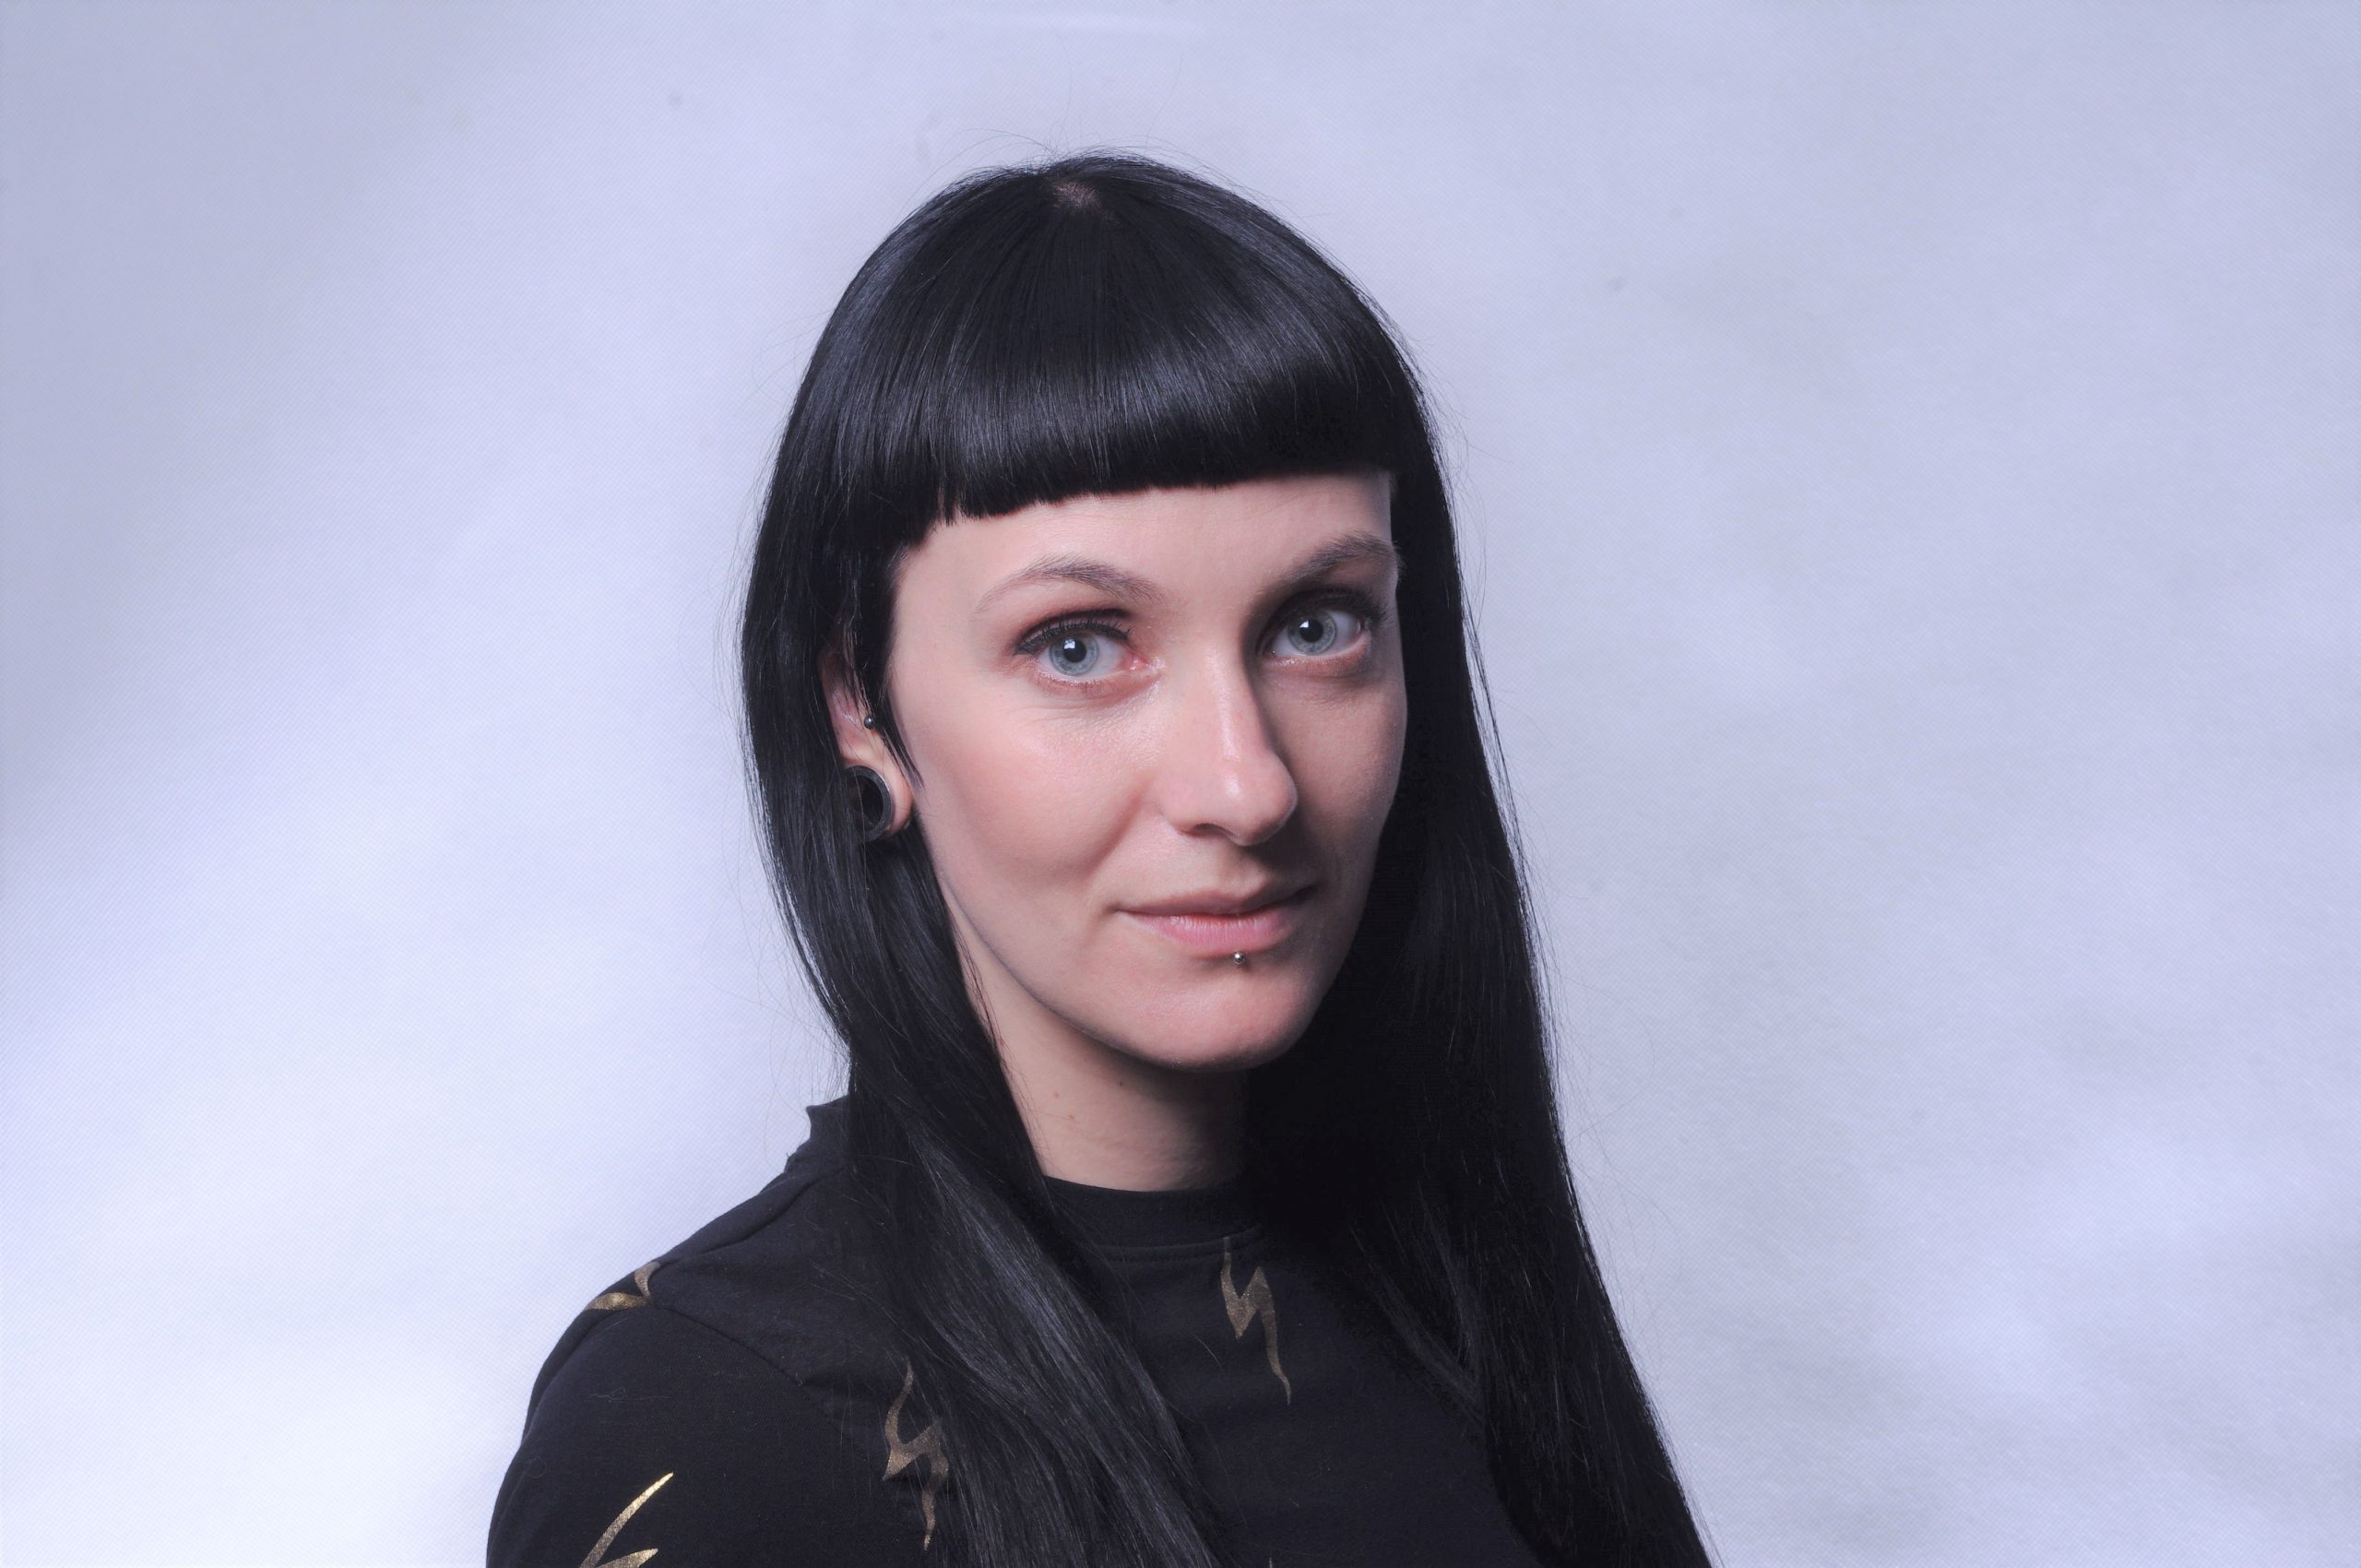 Elżbieta Łapczyńska